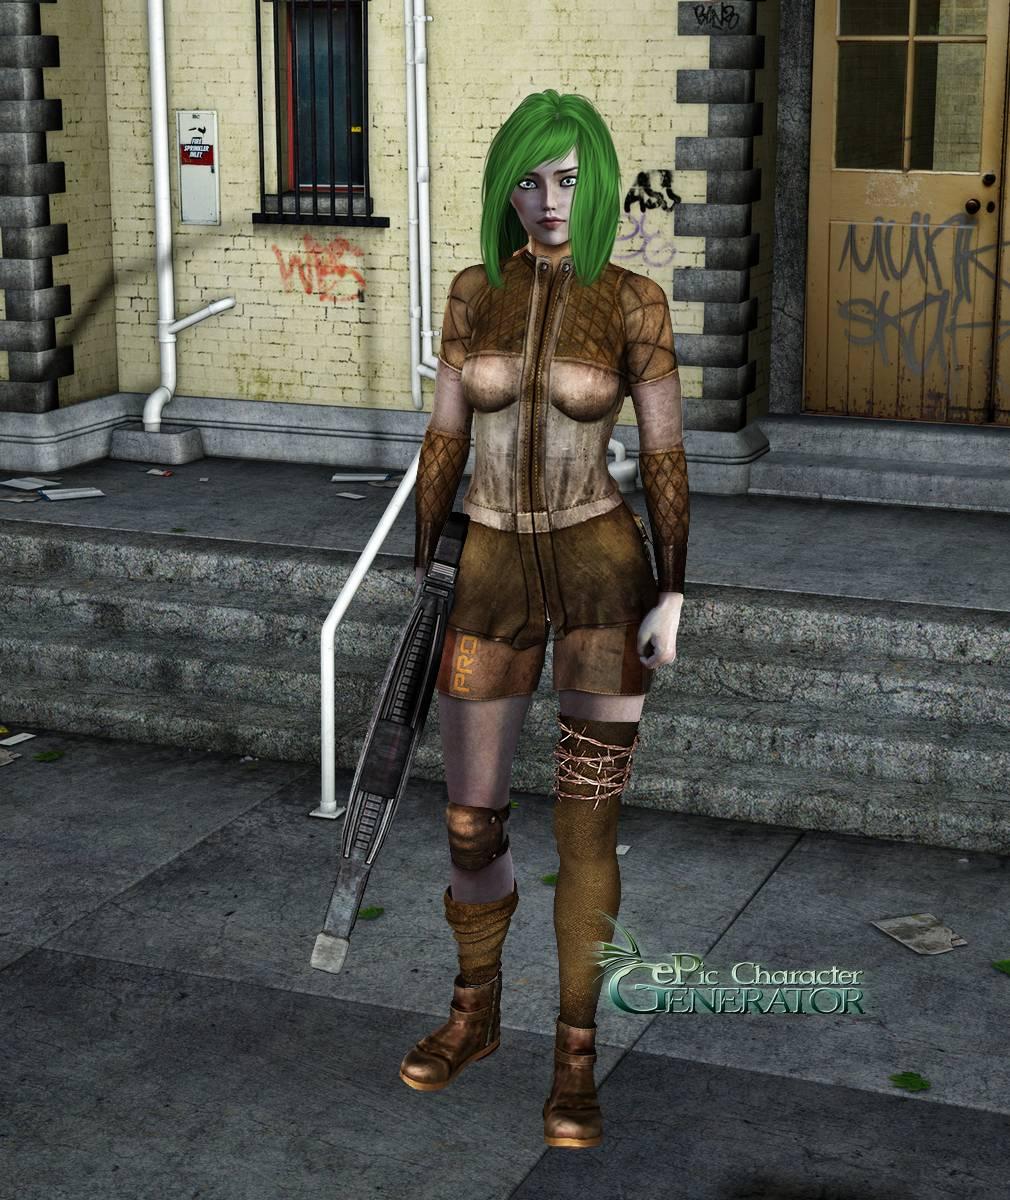 ePic Character Generator Season 2 Female Post Apocalyptic Screenshot 10